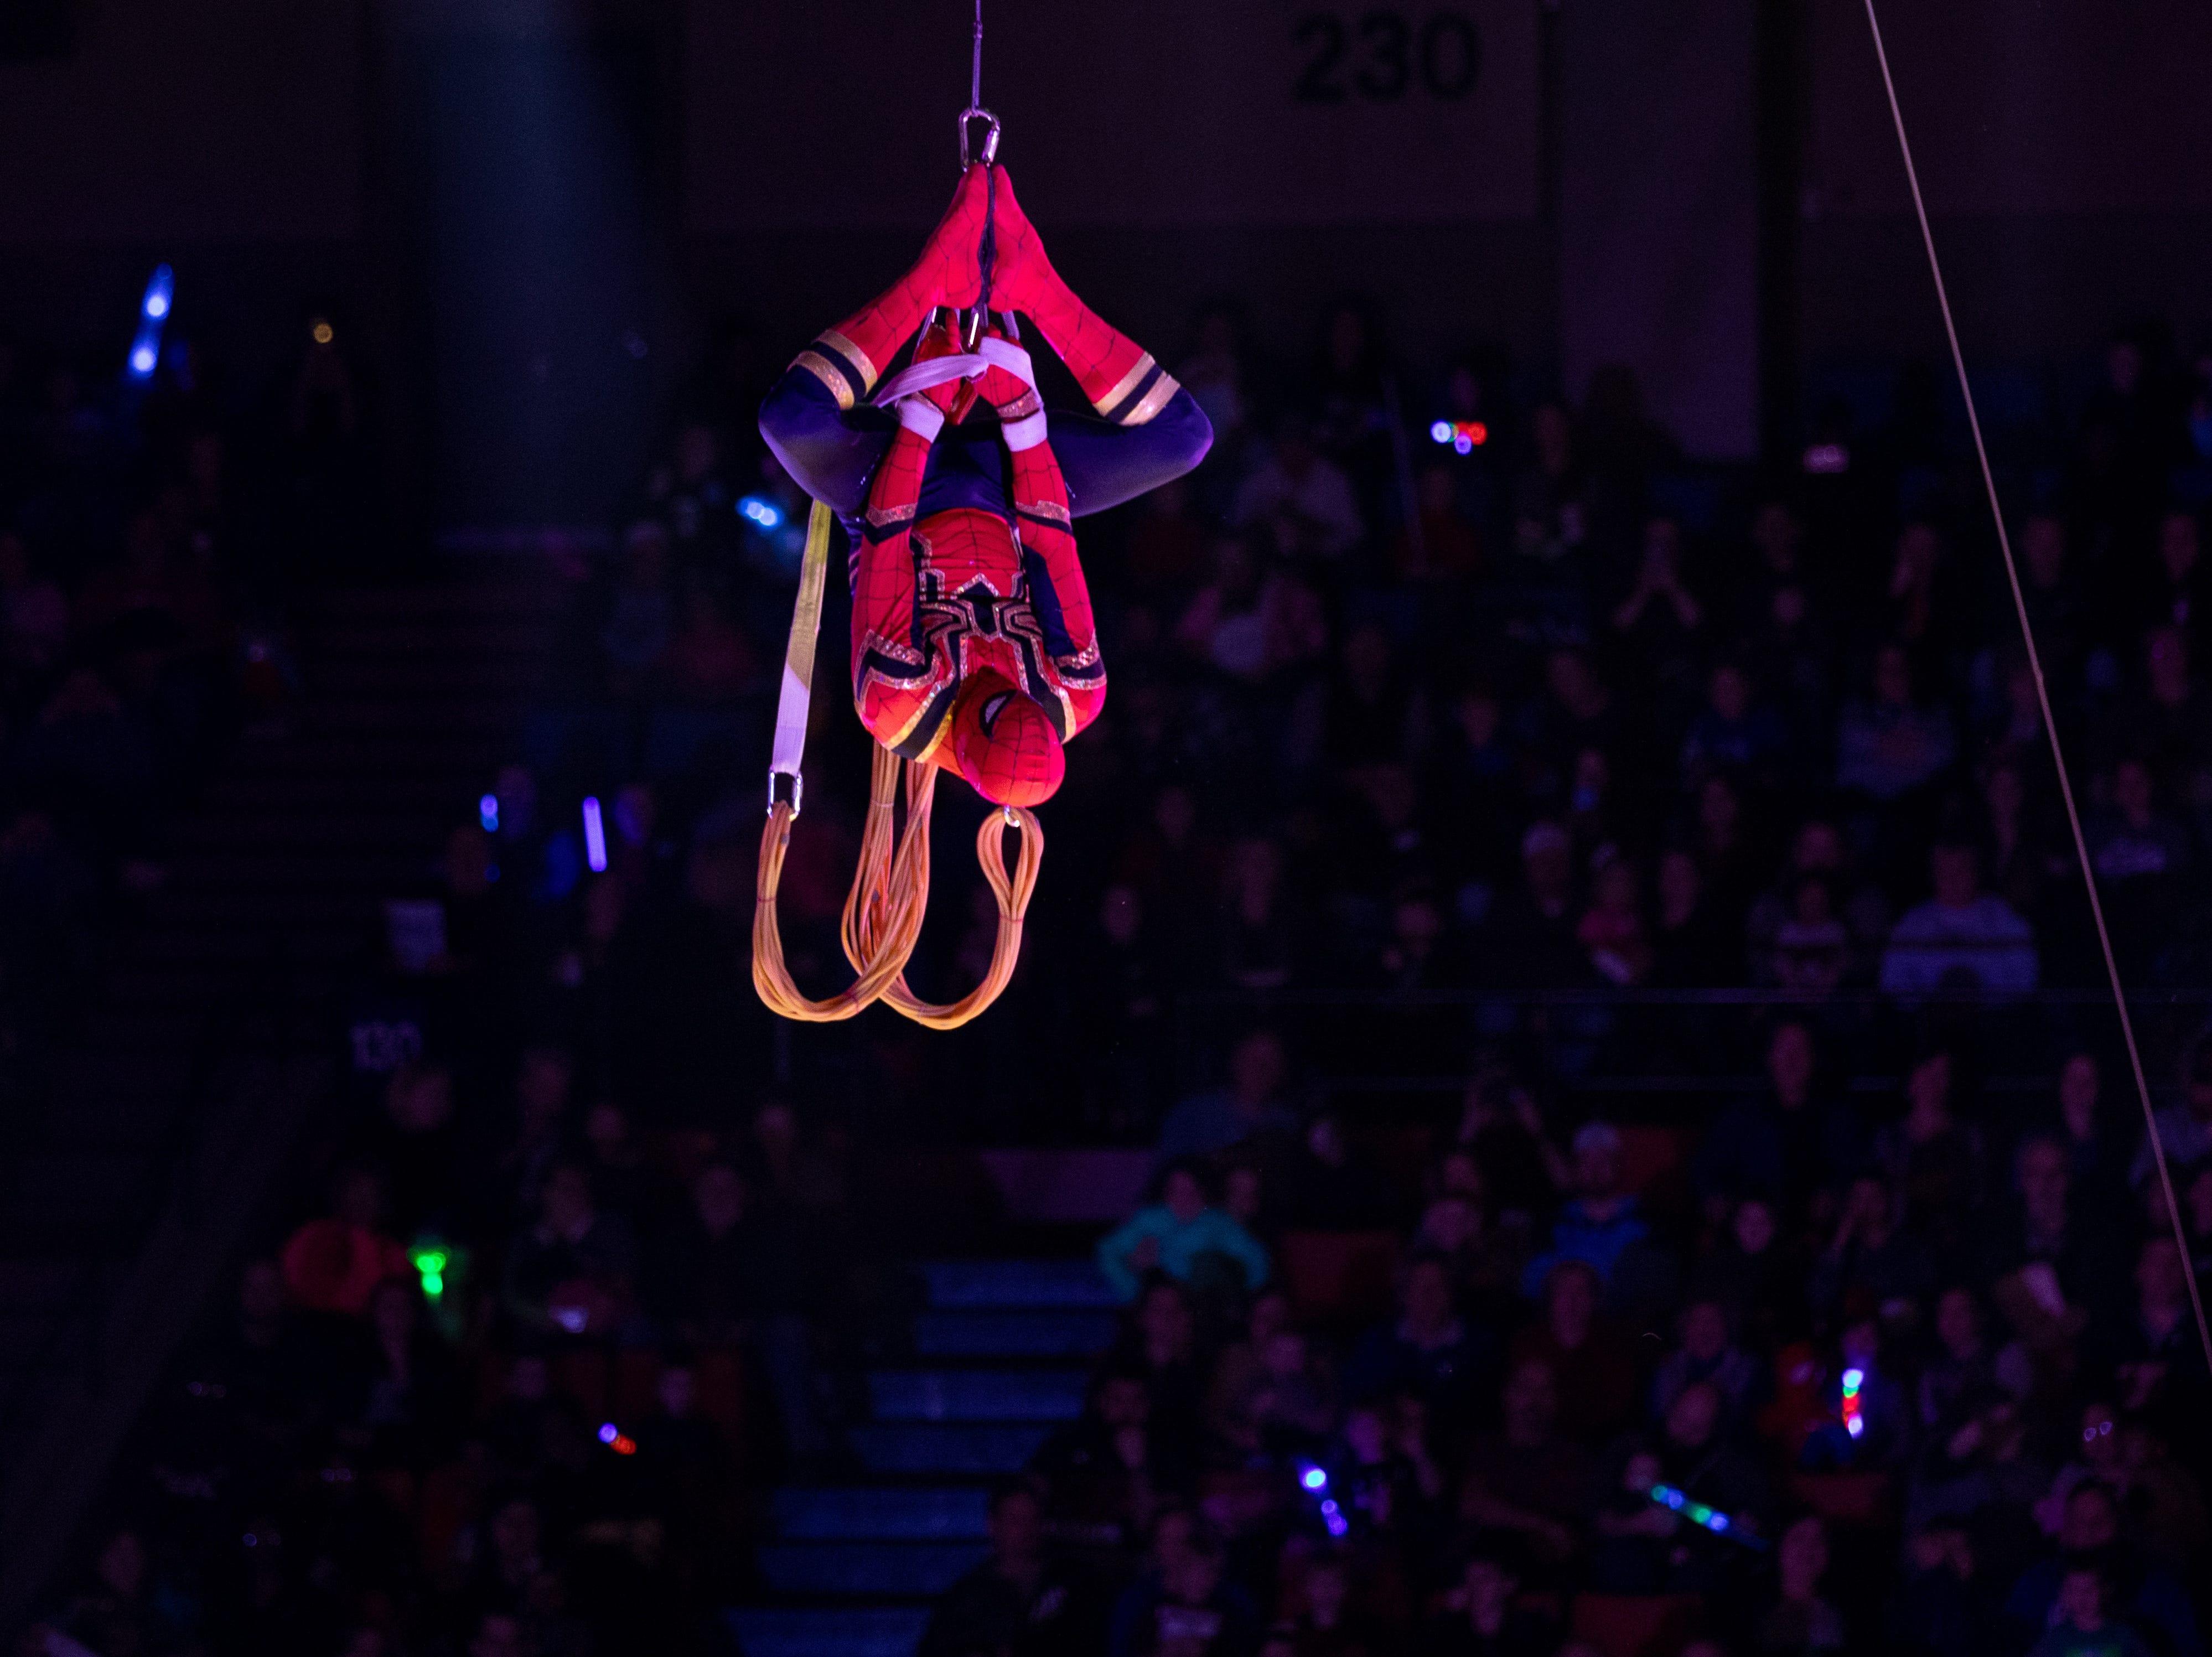 Spiderman swings in upside down to open the Kosair Circus, Saturday, Feb. 9, 2019 in Louisville Ky.